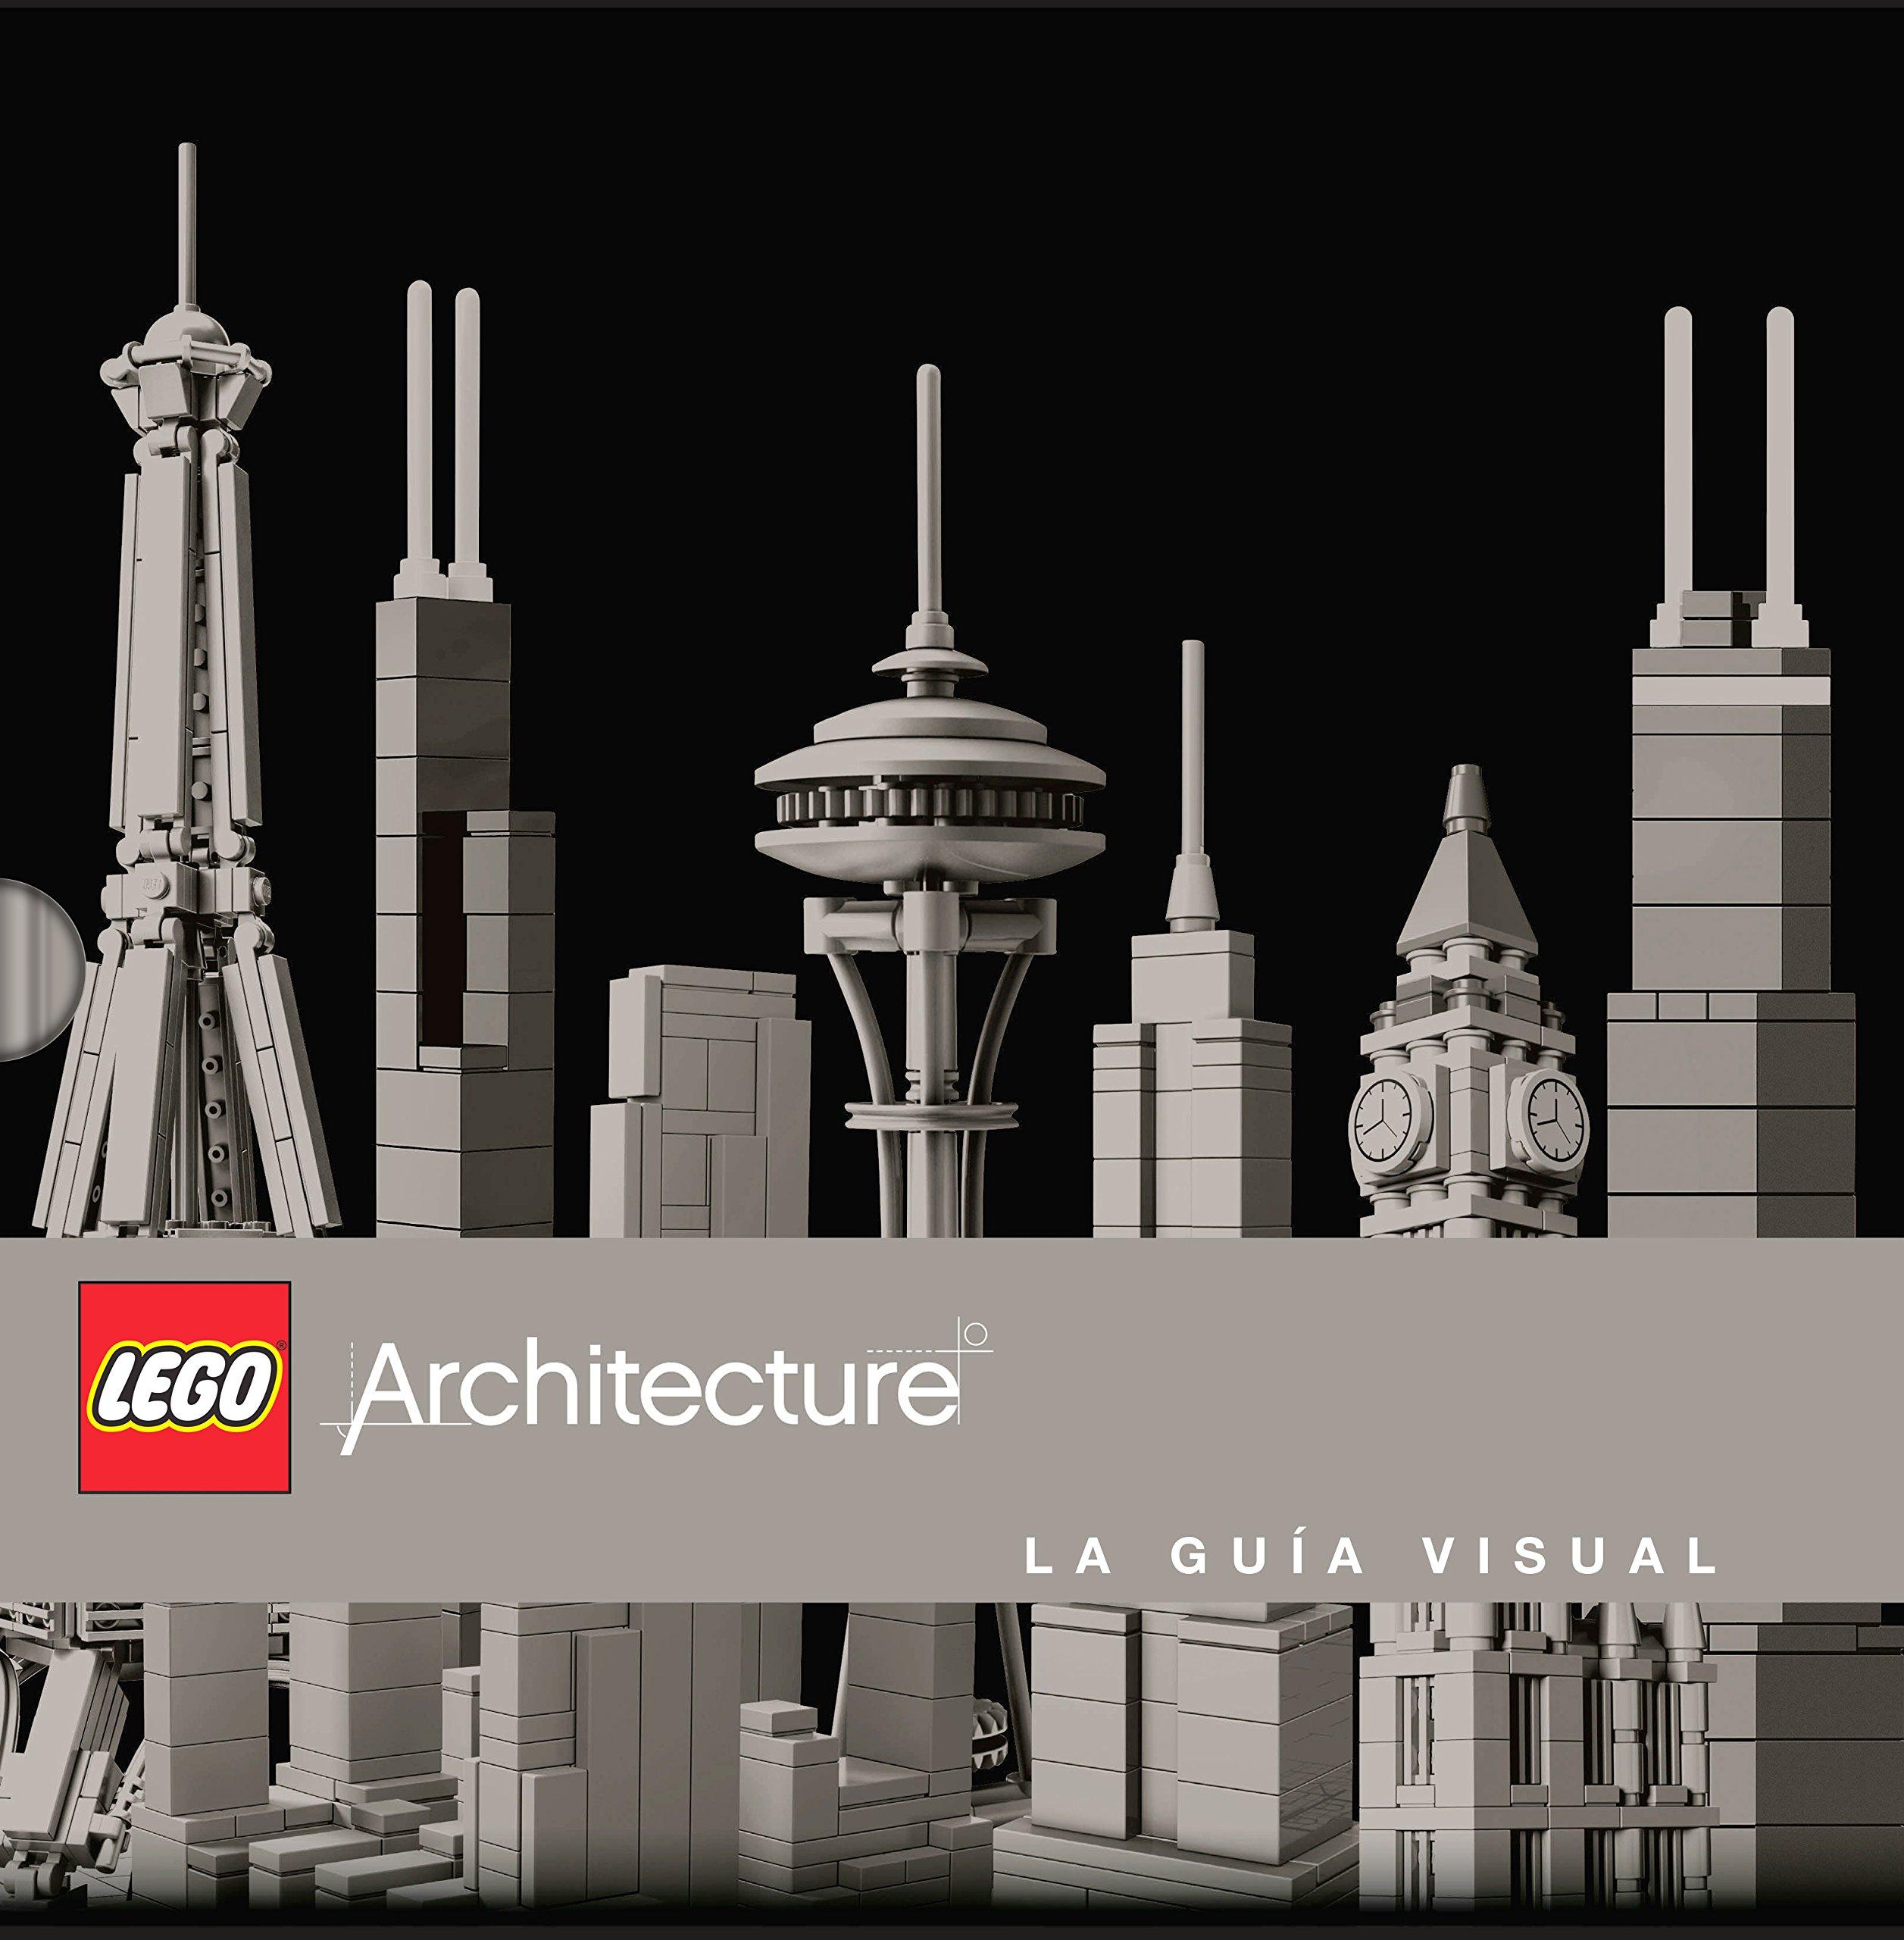 LegoArchitecture. Guía Visual Tapa blanda – 31 mar 2015 Varios autores DK 024118651X ARCHITECTURE / General